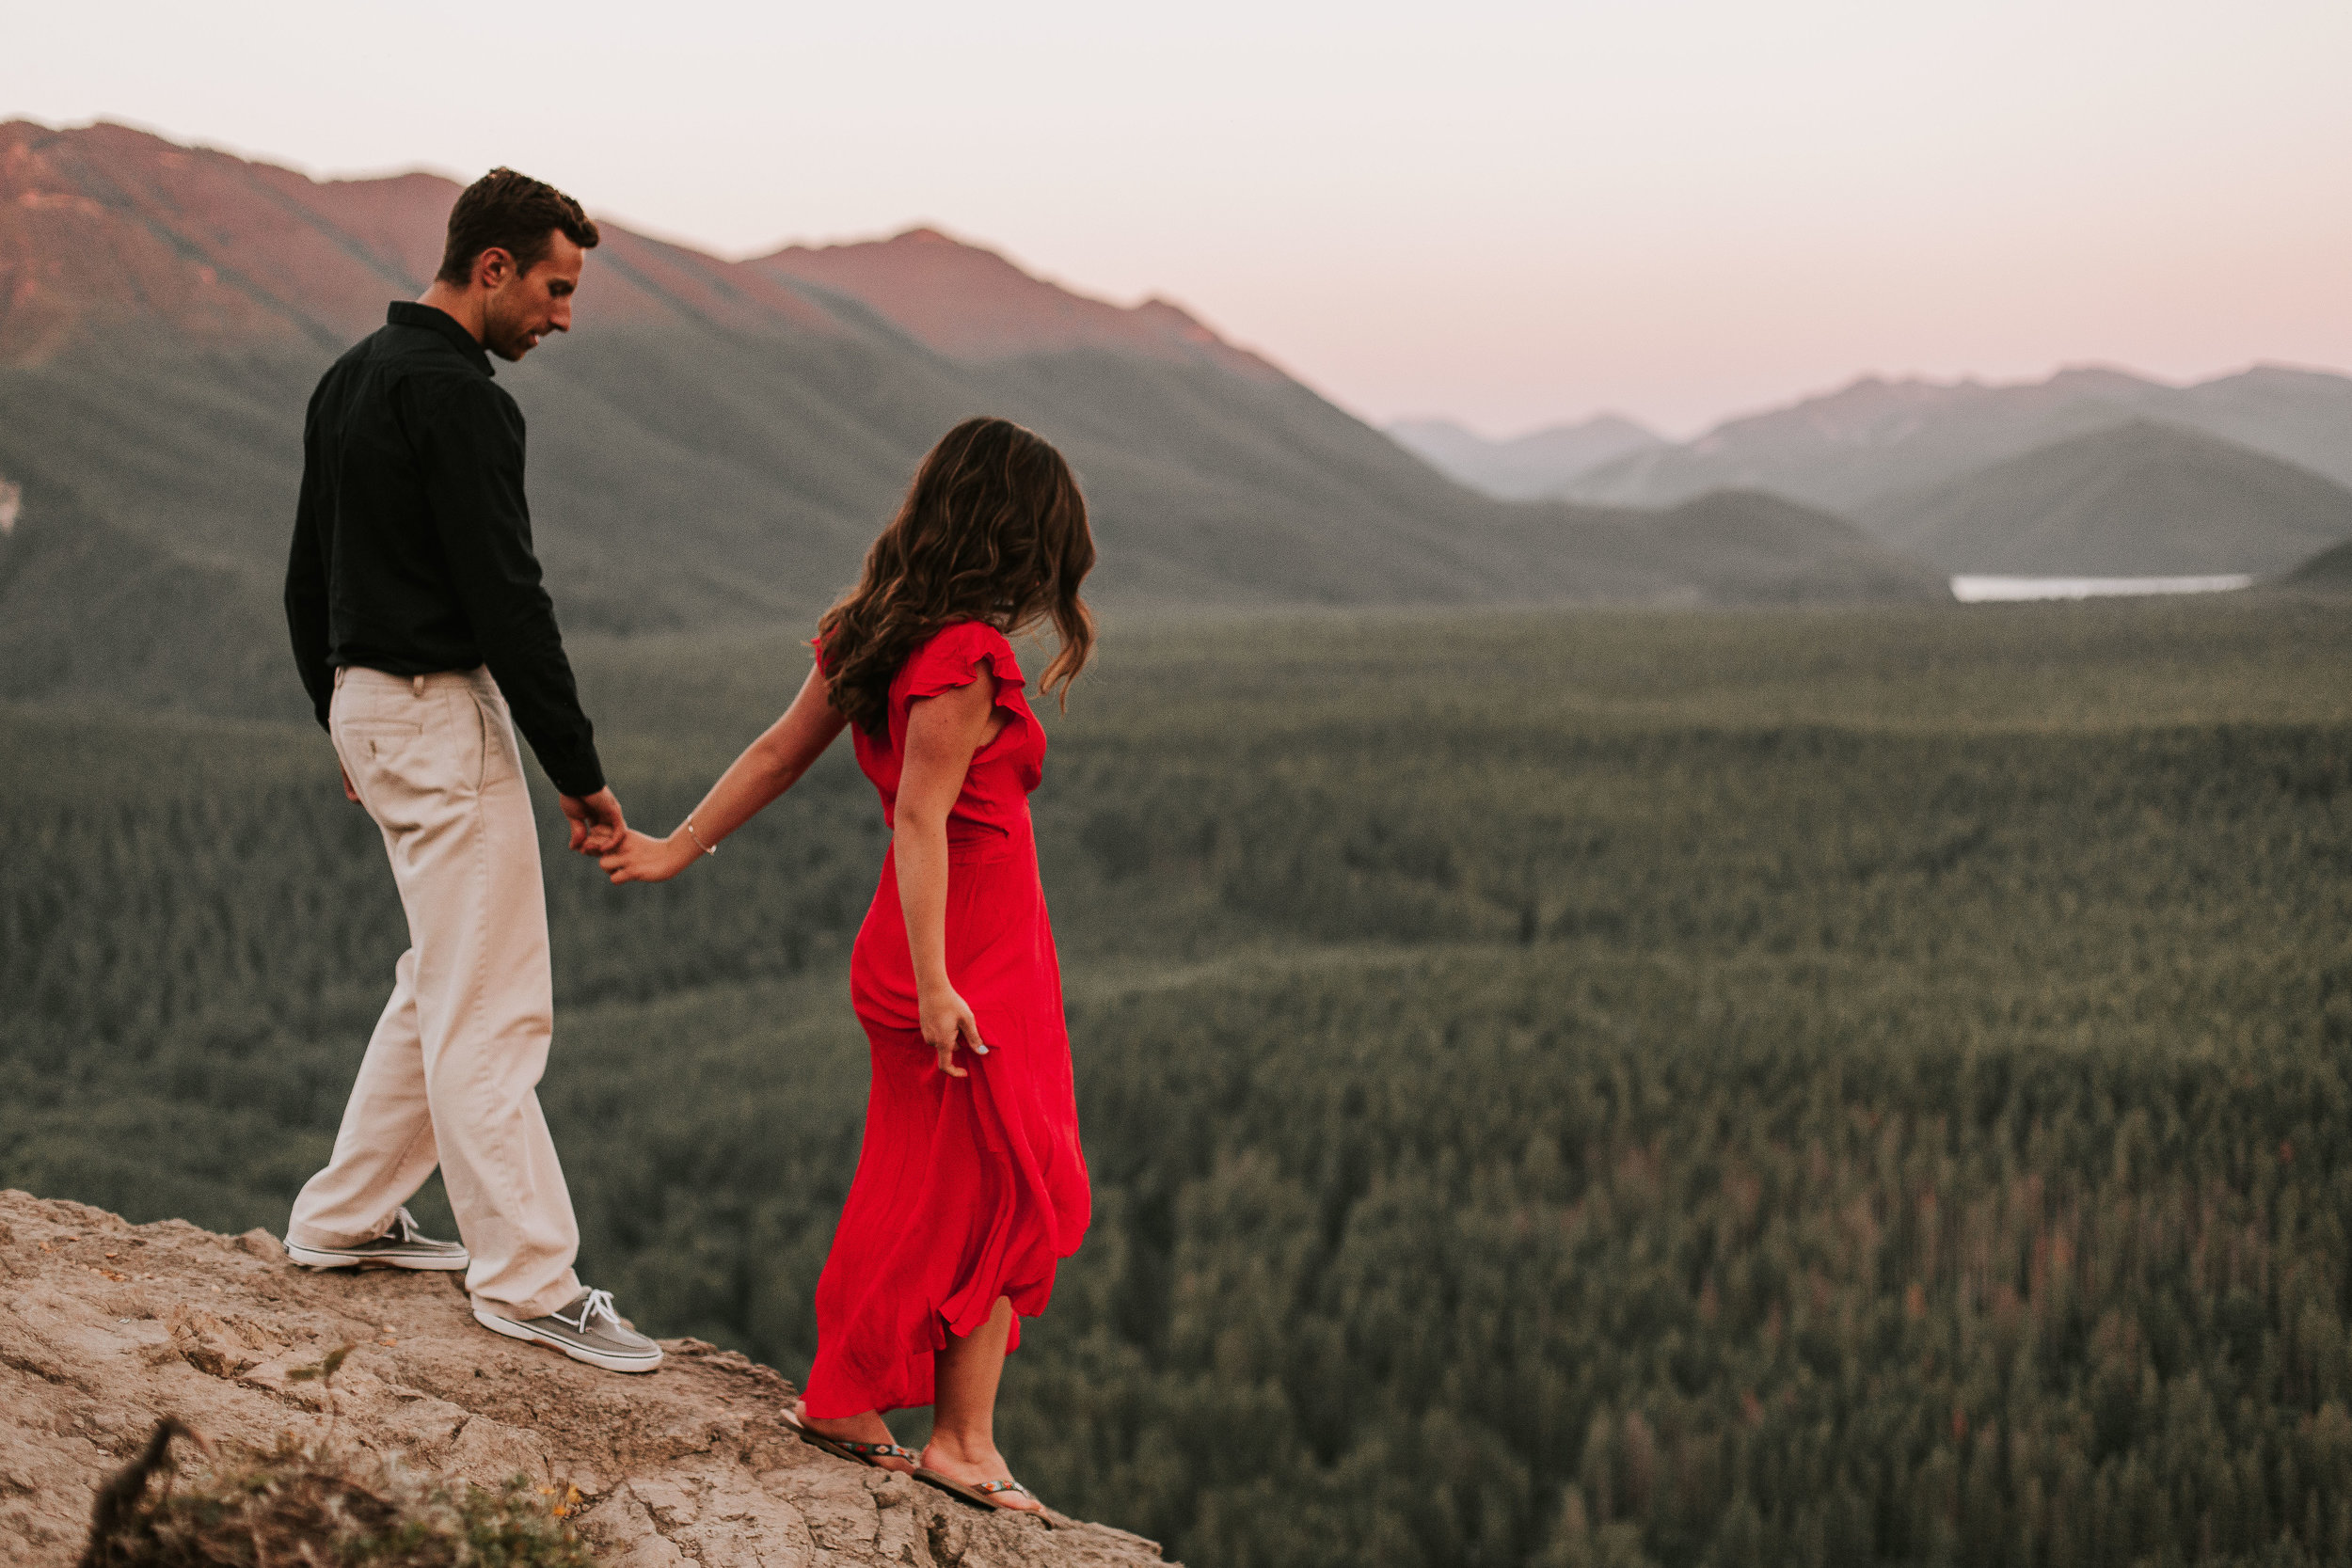 nicole-daacke-photography-rattlesnake-ridge-adventurous-engagement-session-hiking-seattle-washington-destinatino-elopement-intimate-wedding-photographer-28.jpg